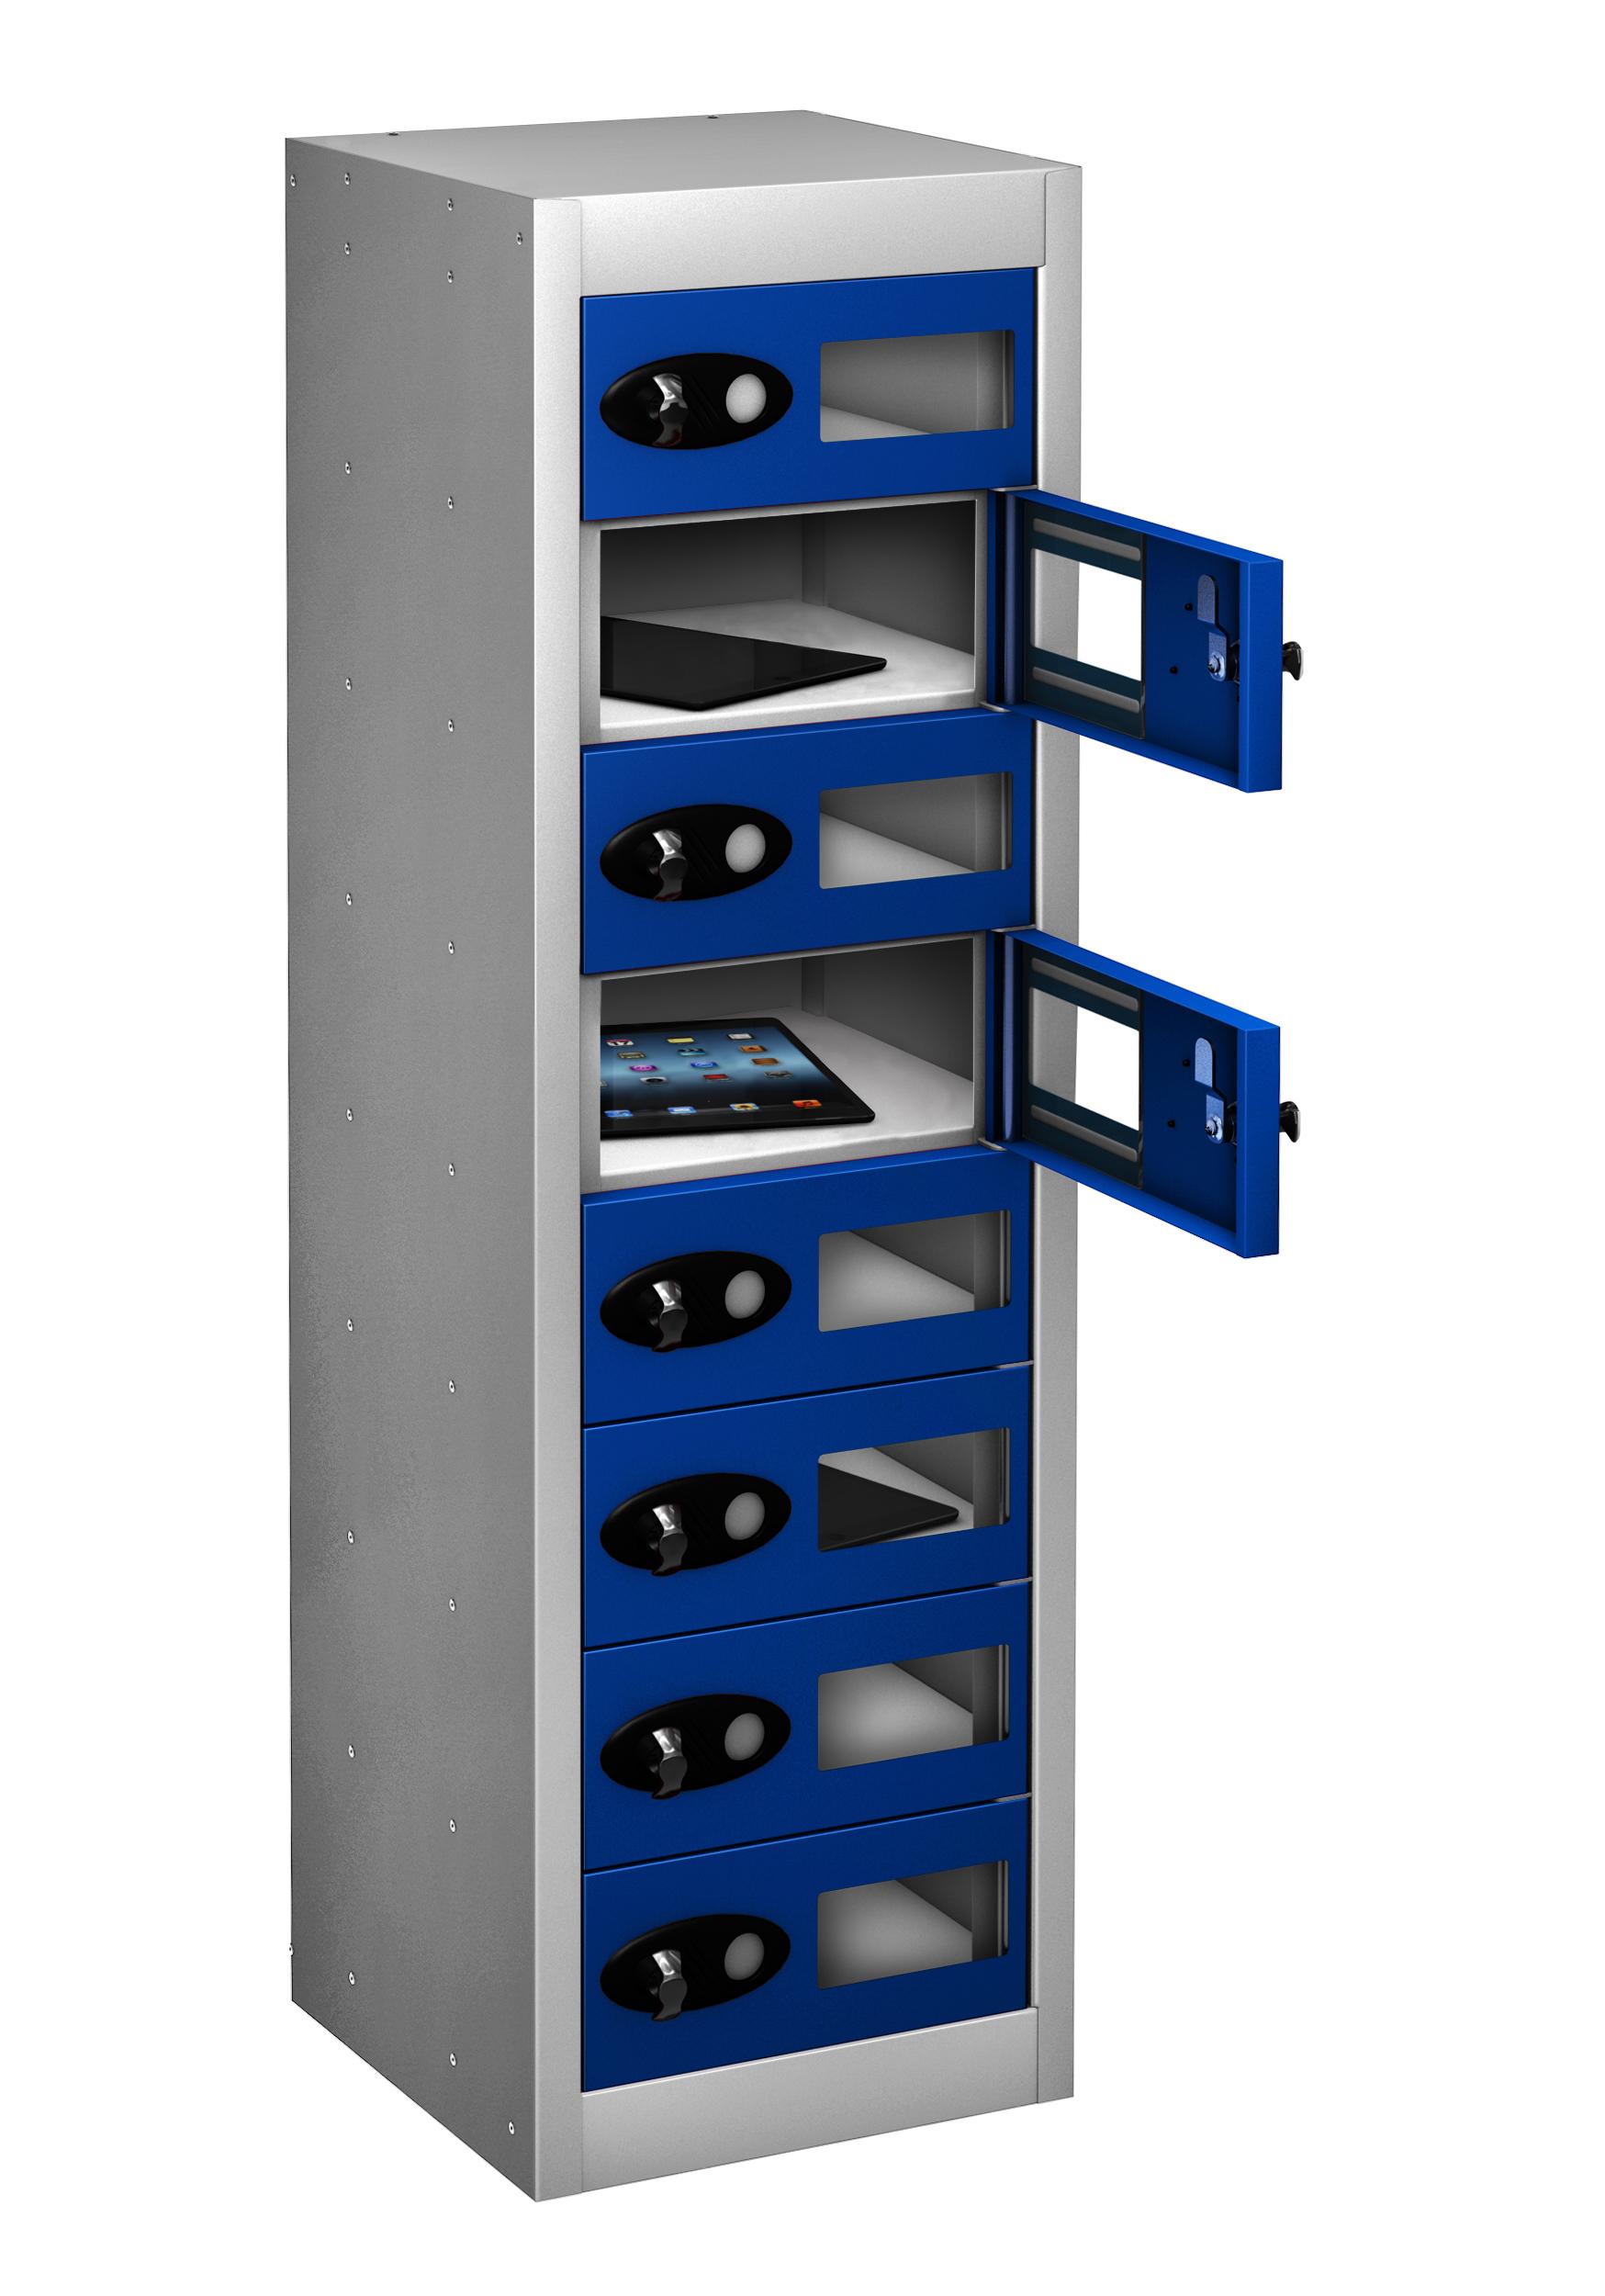 Low Vision Panel Mobile Phone Storage Locker - 8 Doors (Non Charging)